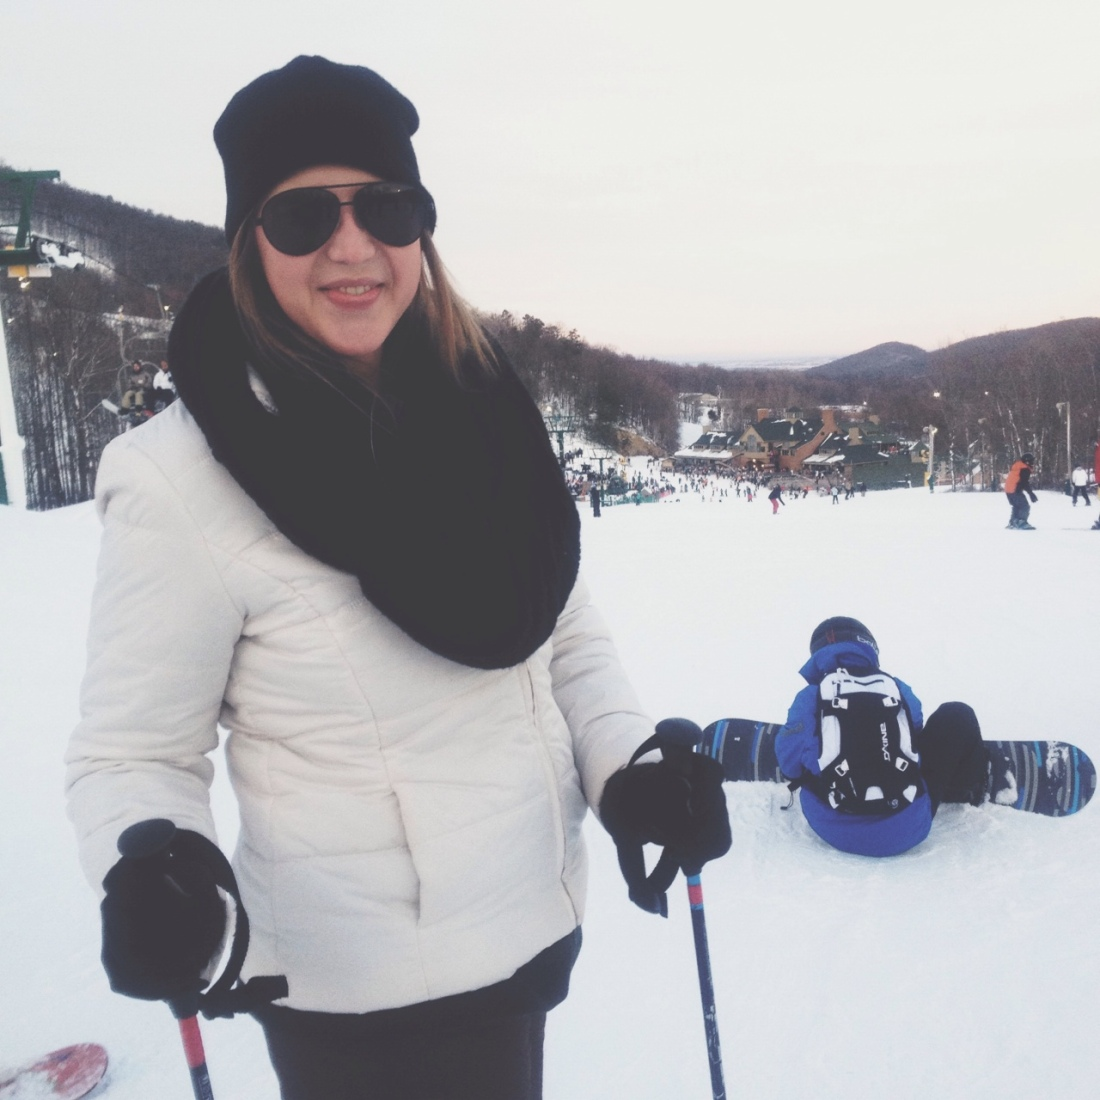 sister skiing trip